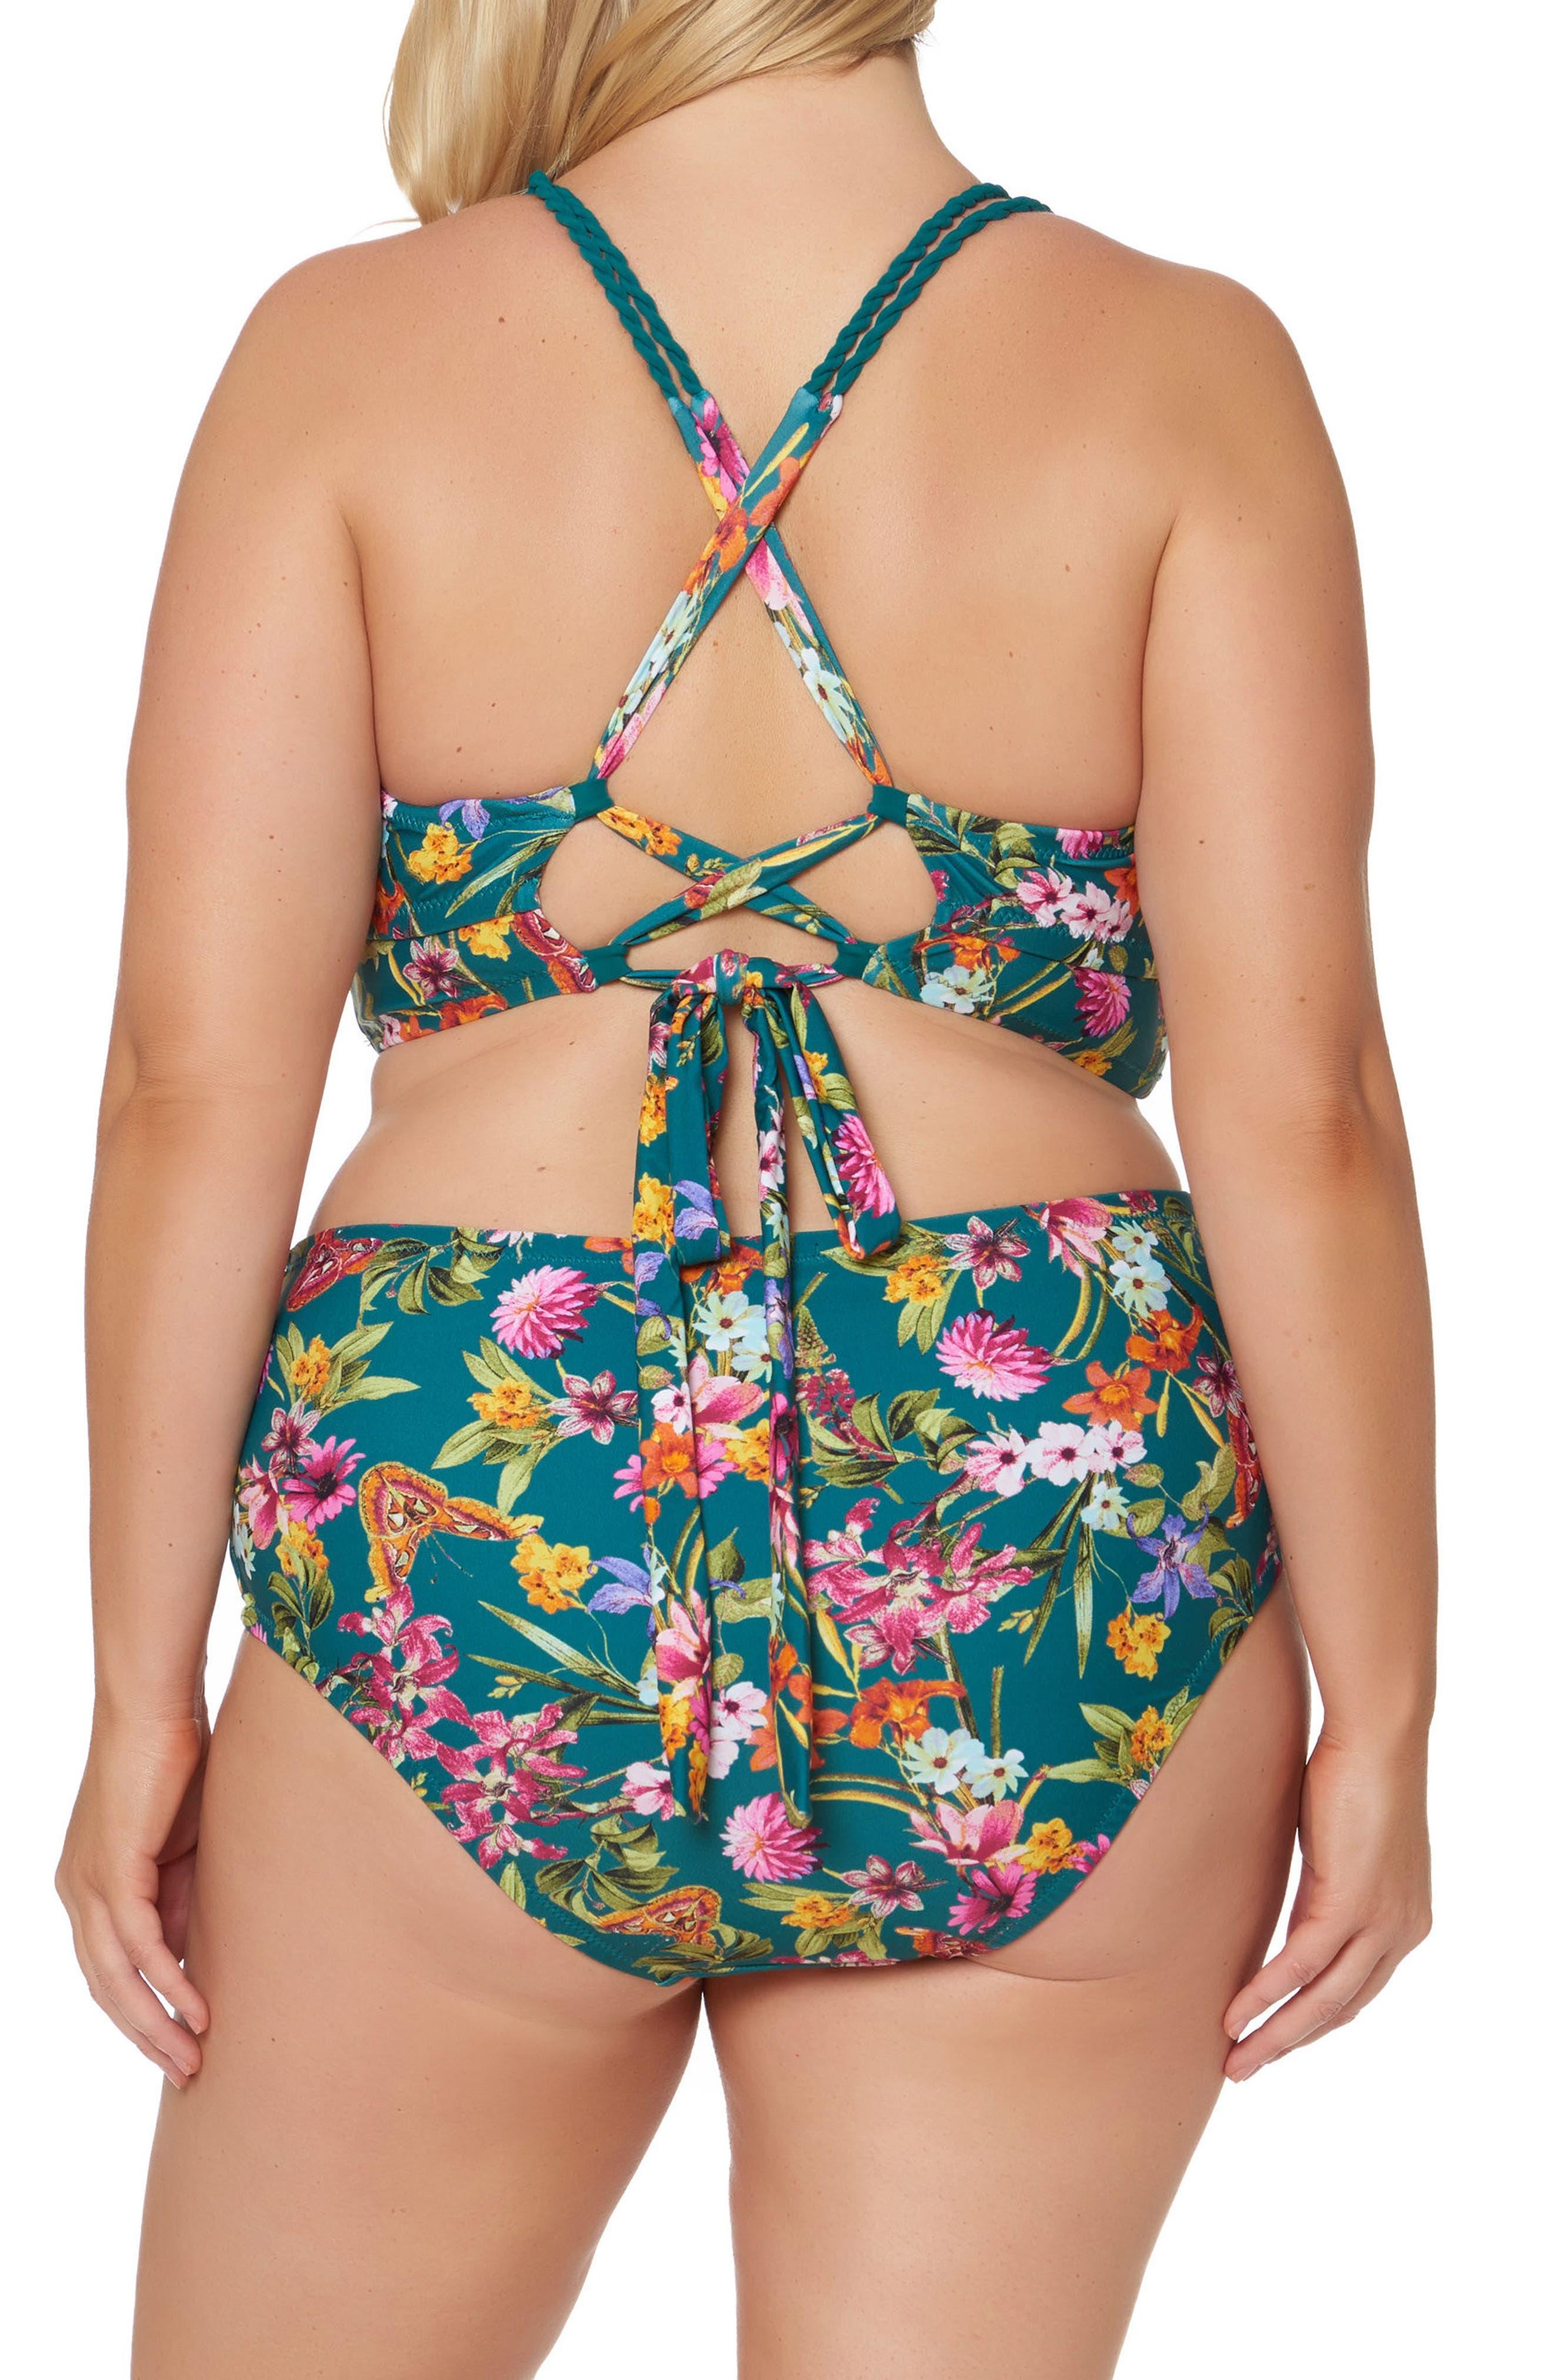 Floral Print Bikini Top,                             Alternate thumbnail 4, color,                             358